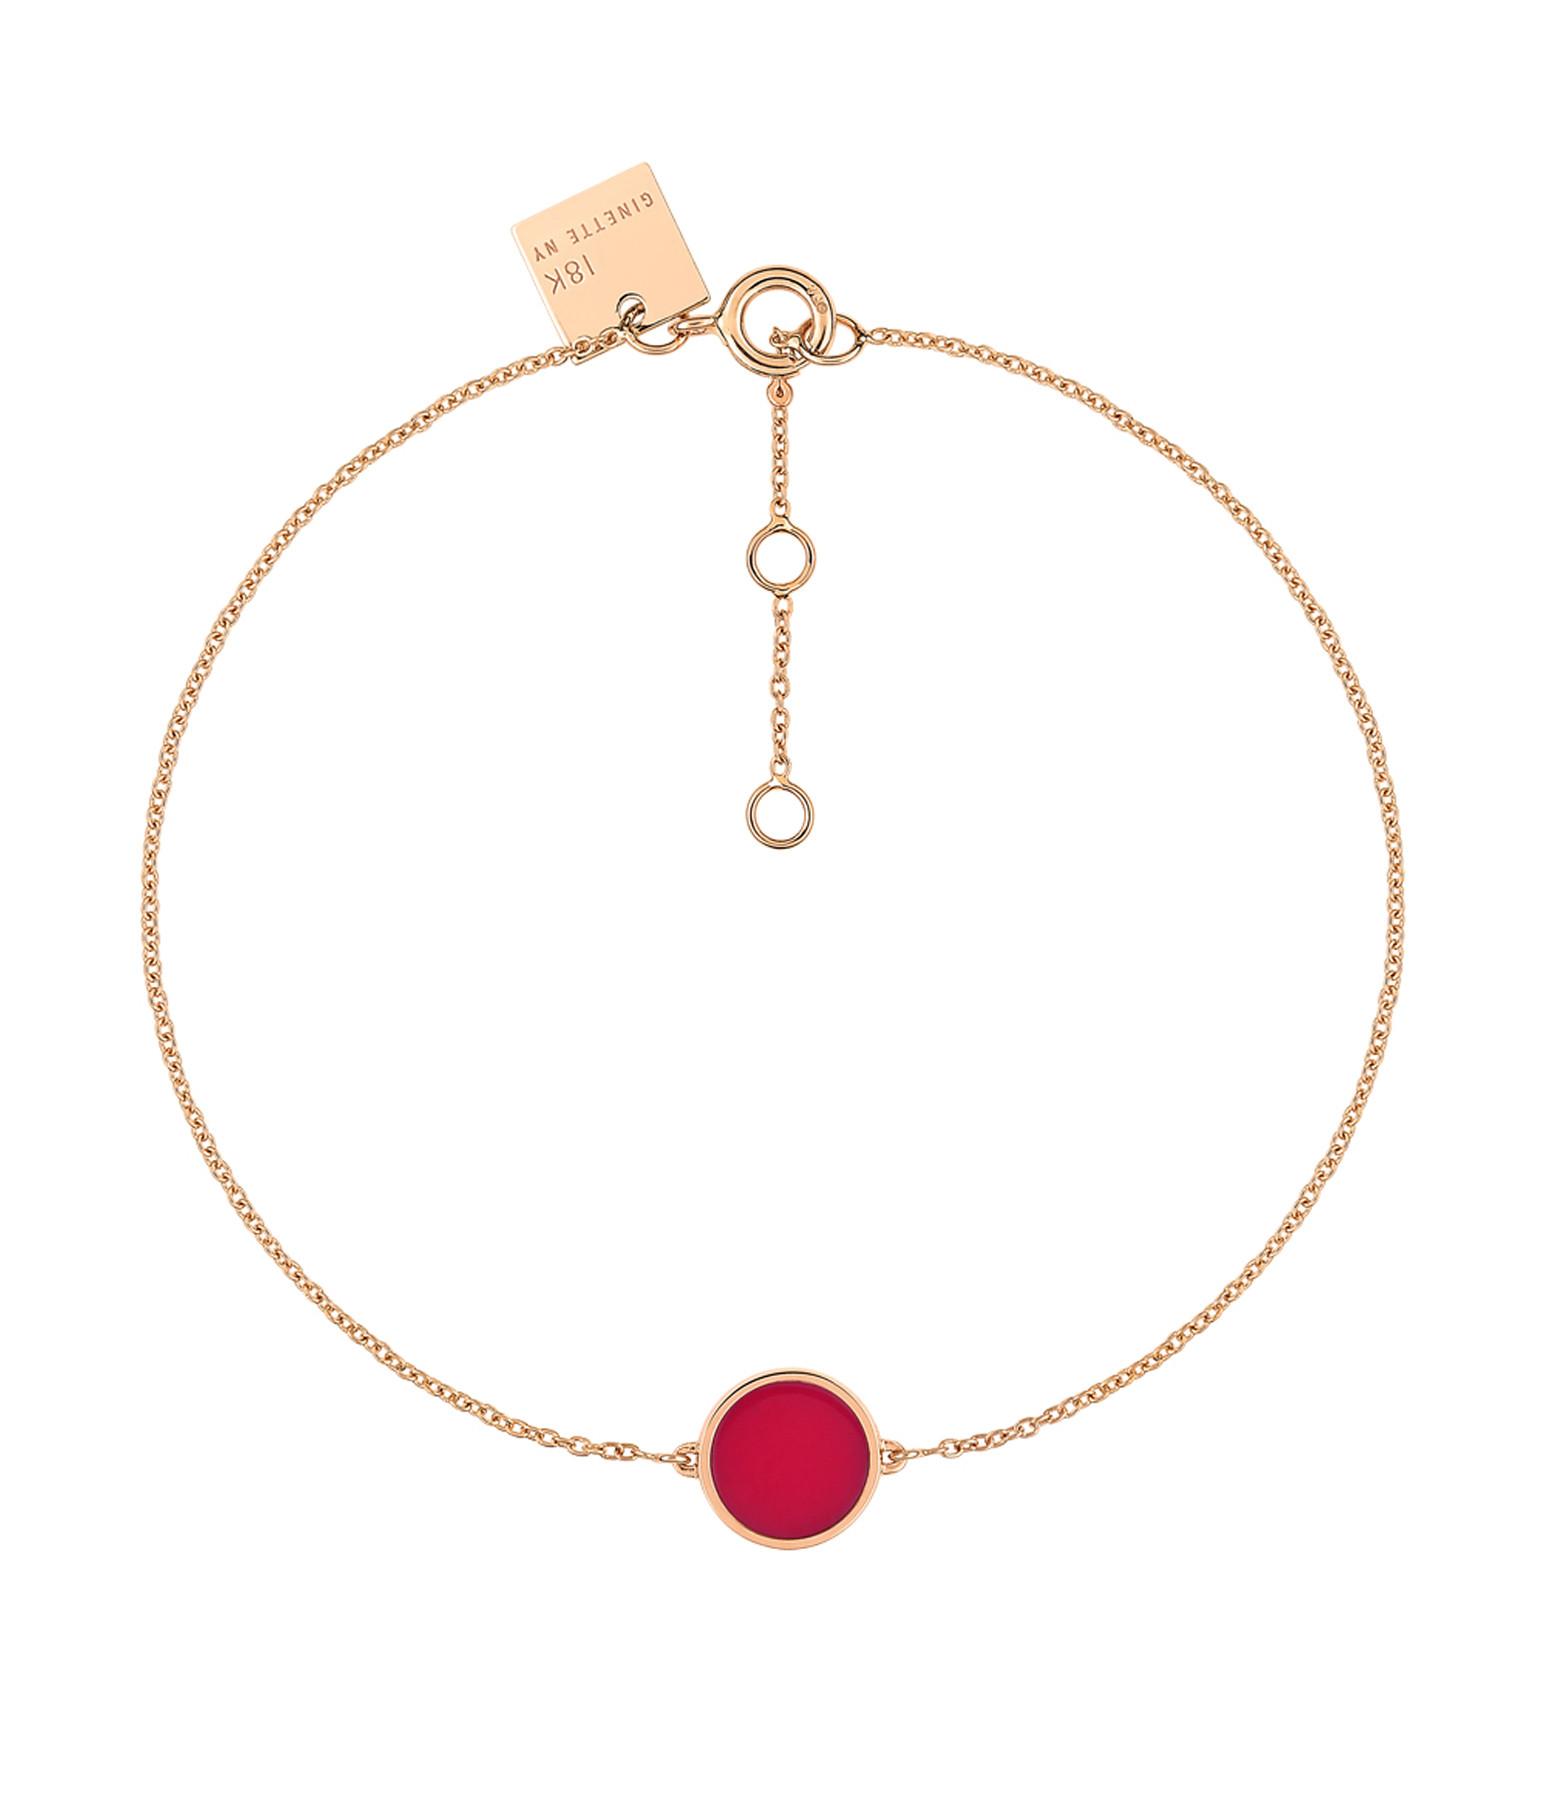 GINETTE NY - Bracelet Ever Mini Disc Or Rose Corail